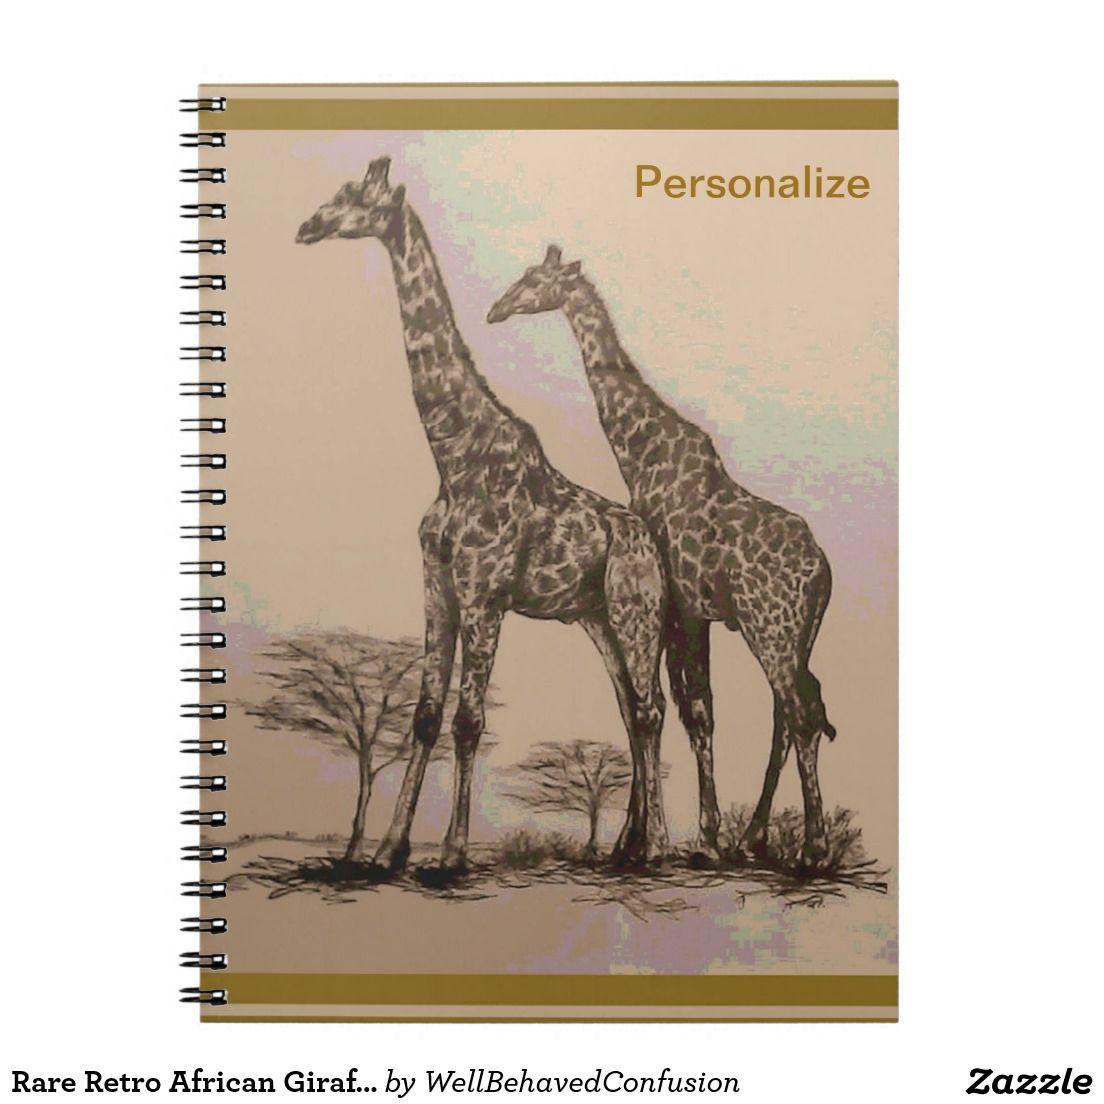 Rare Retro African Giraffes in Sepia & Pastels Notebook ...